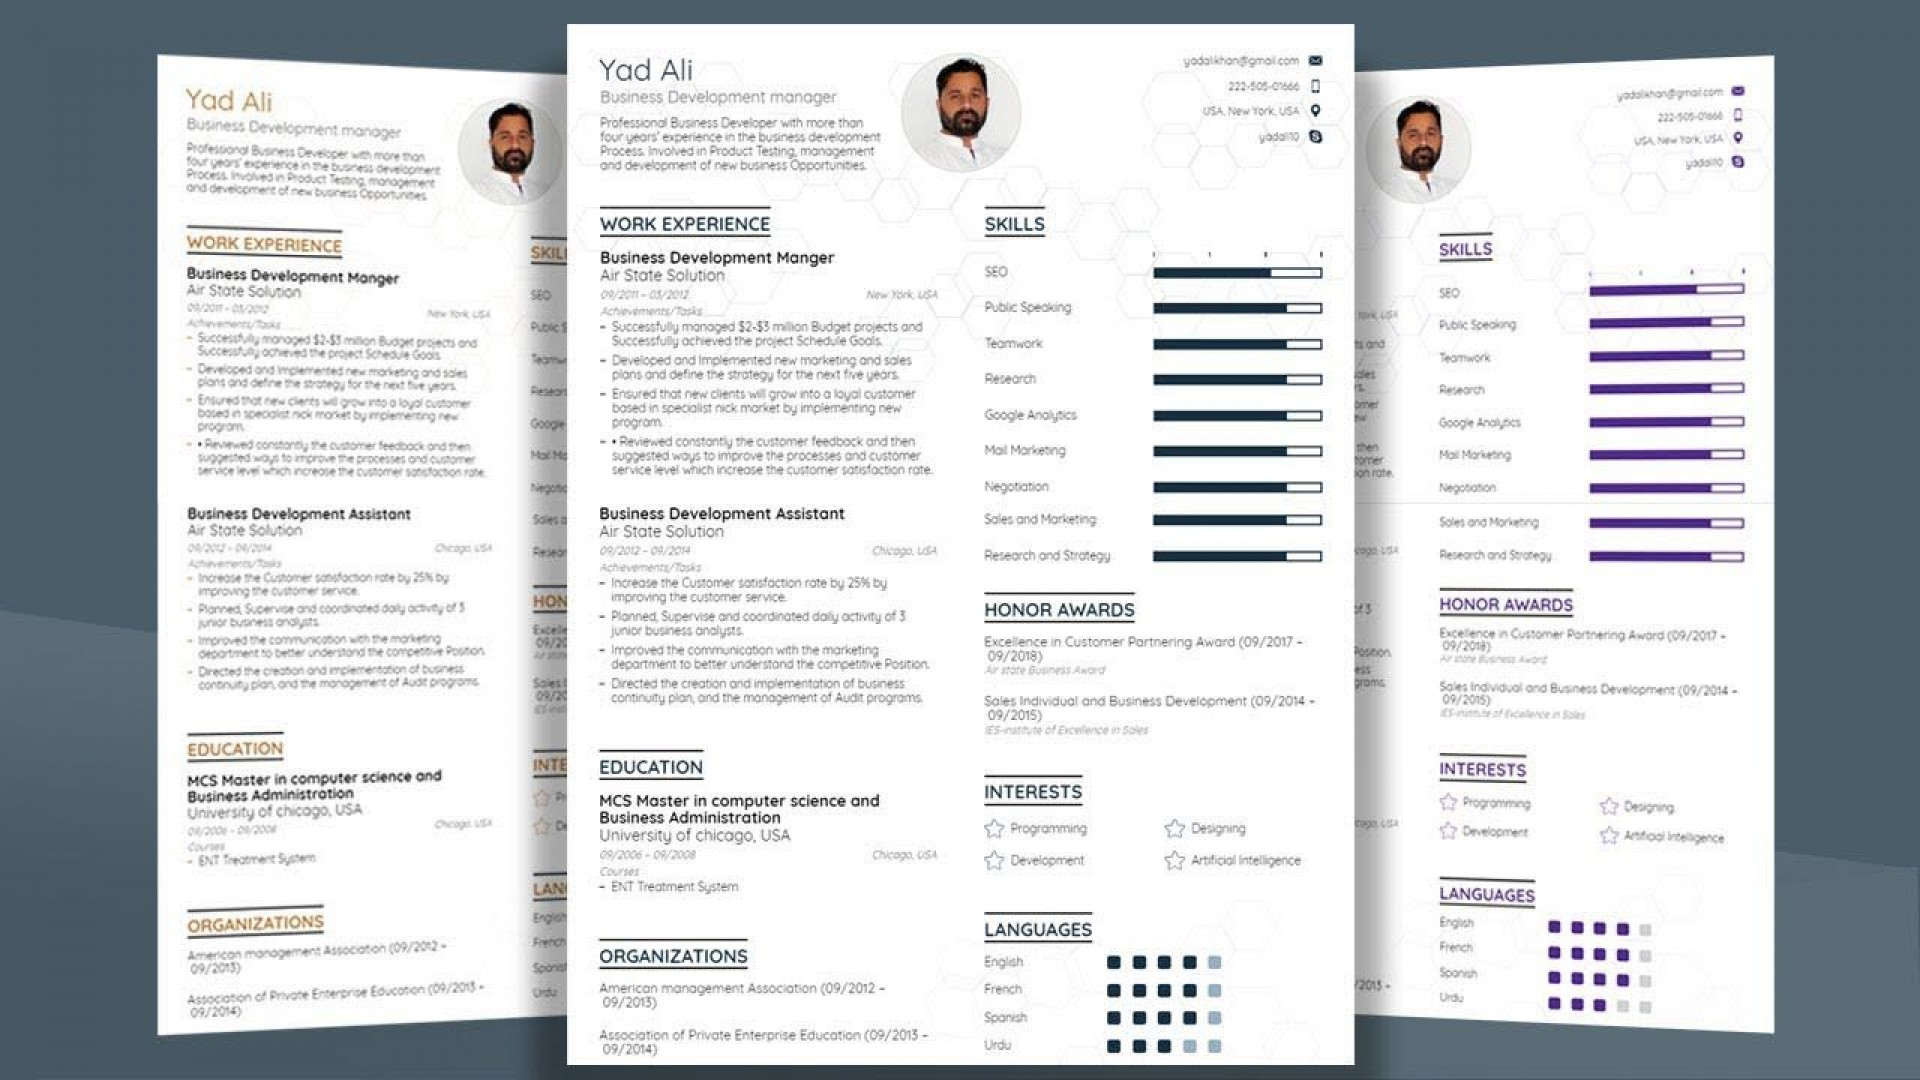 005 Formidable Resume Template Microsoft Word 2019 Design  Free1920